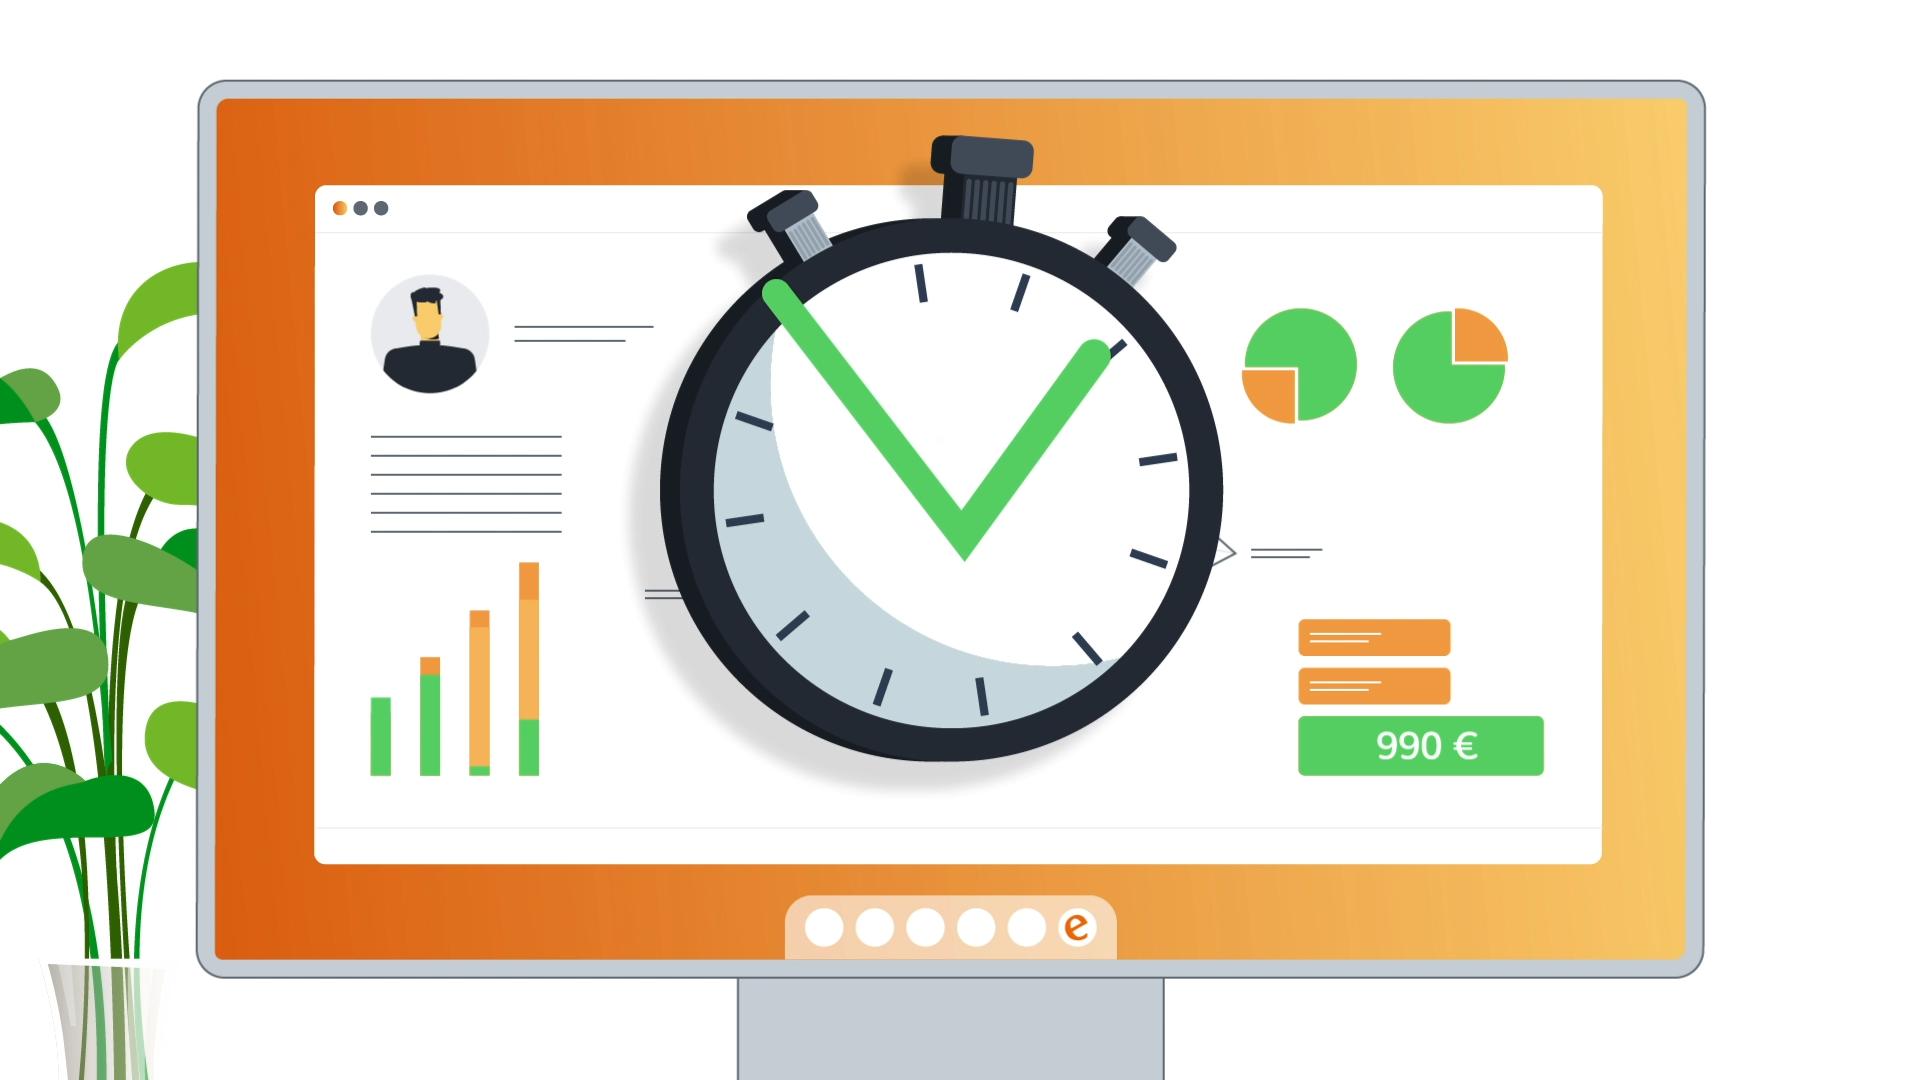 Présentation Incentive Manager ToolSuite Motion Design - ES